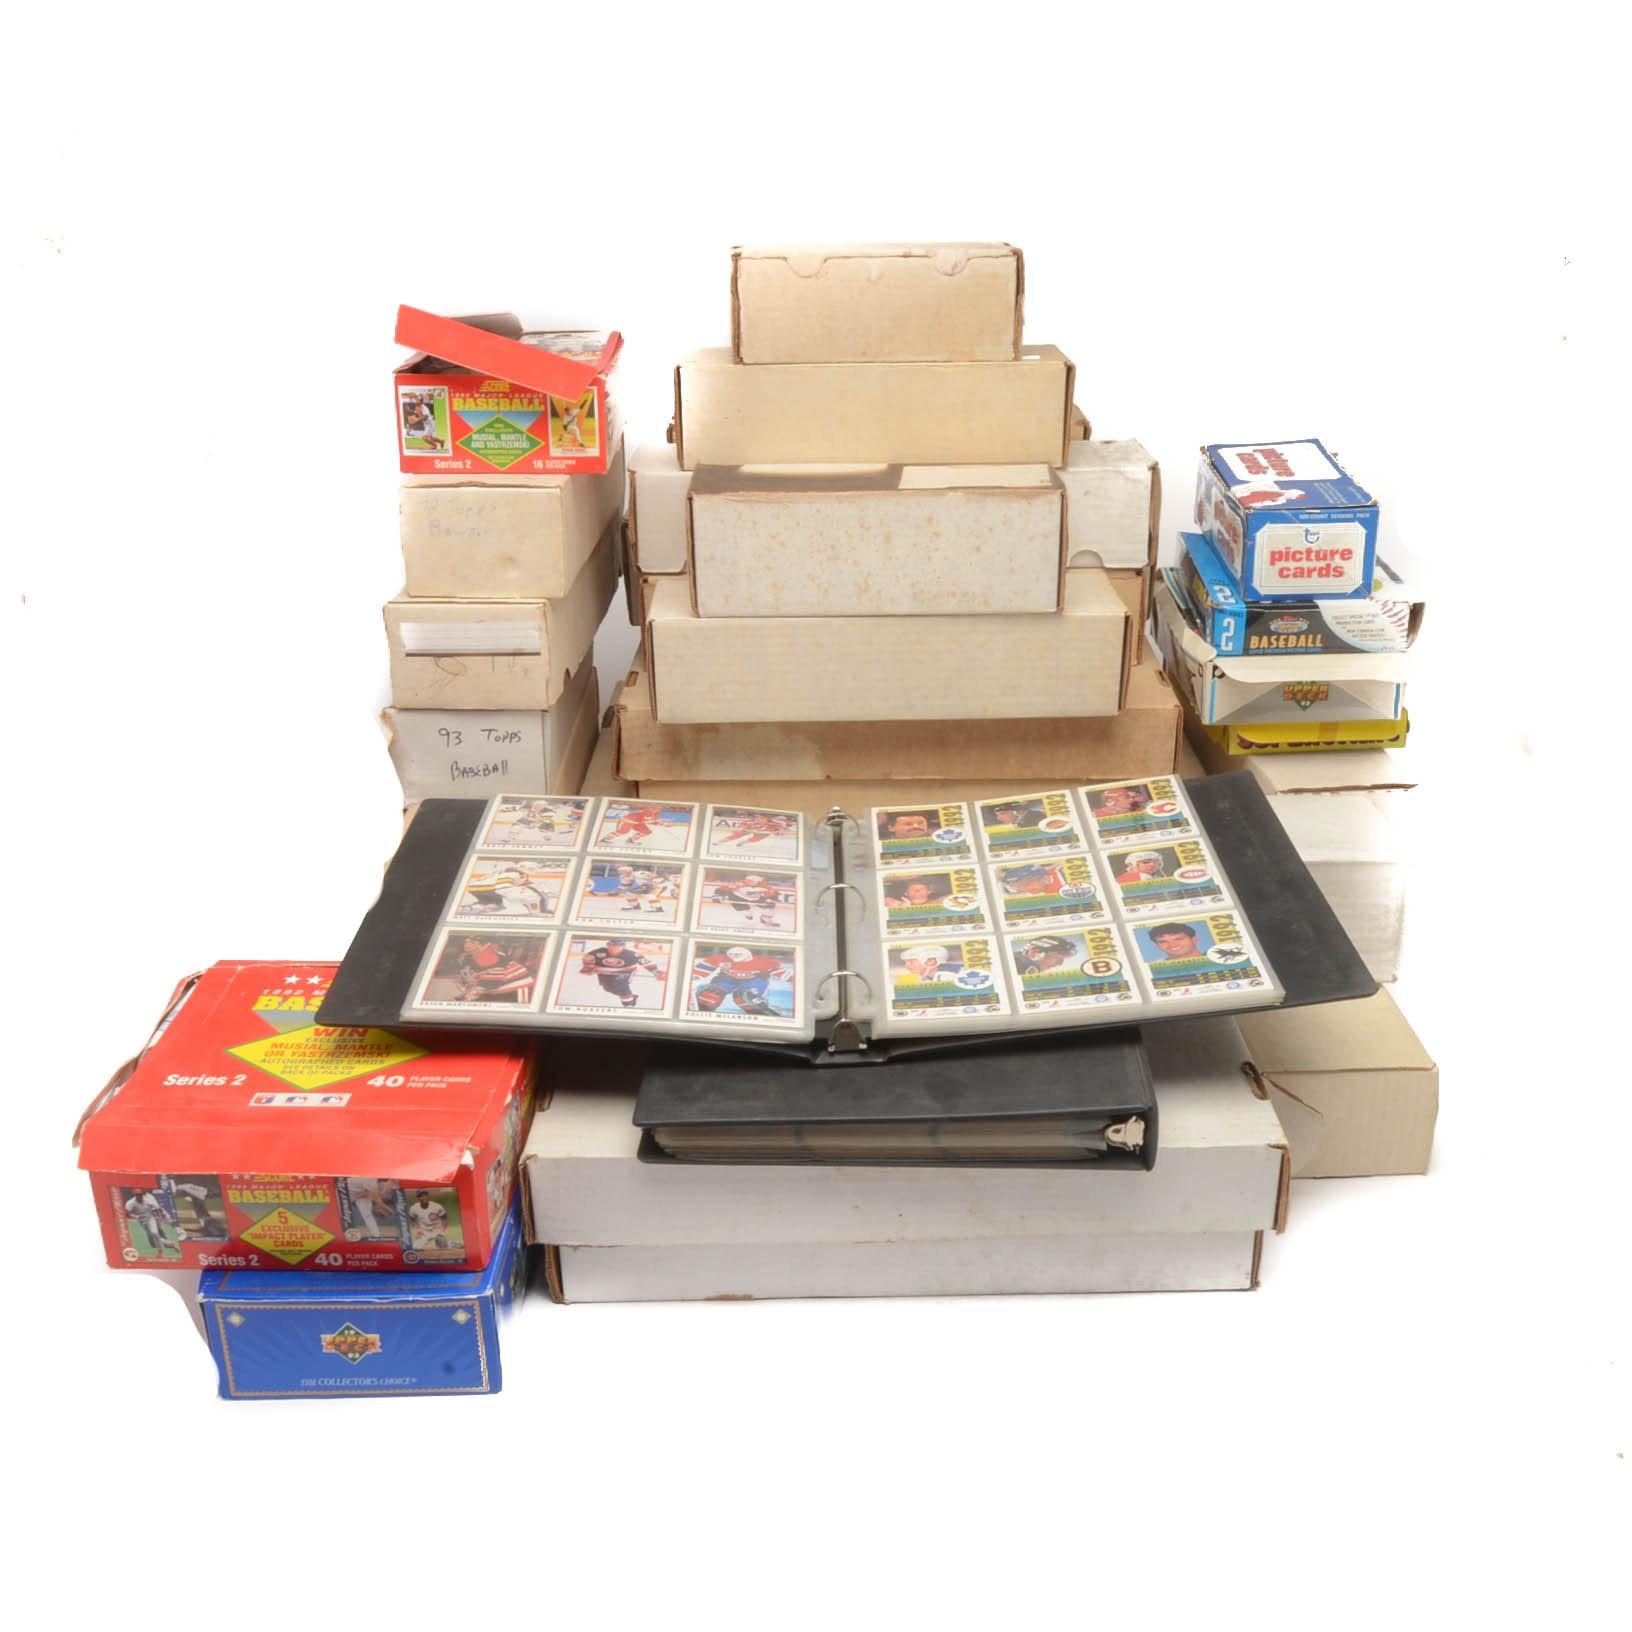 Massive Collection Of 1980s 1990s Baseball, Football, And Basketball Cards